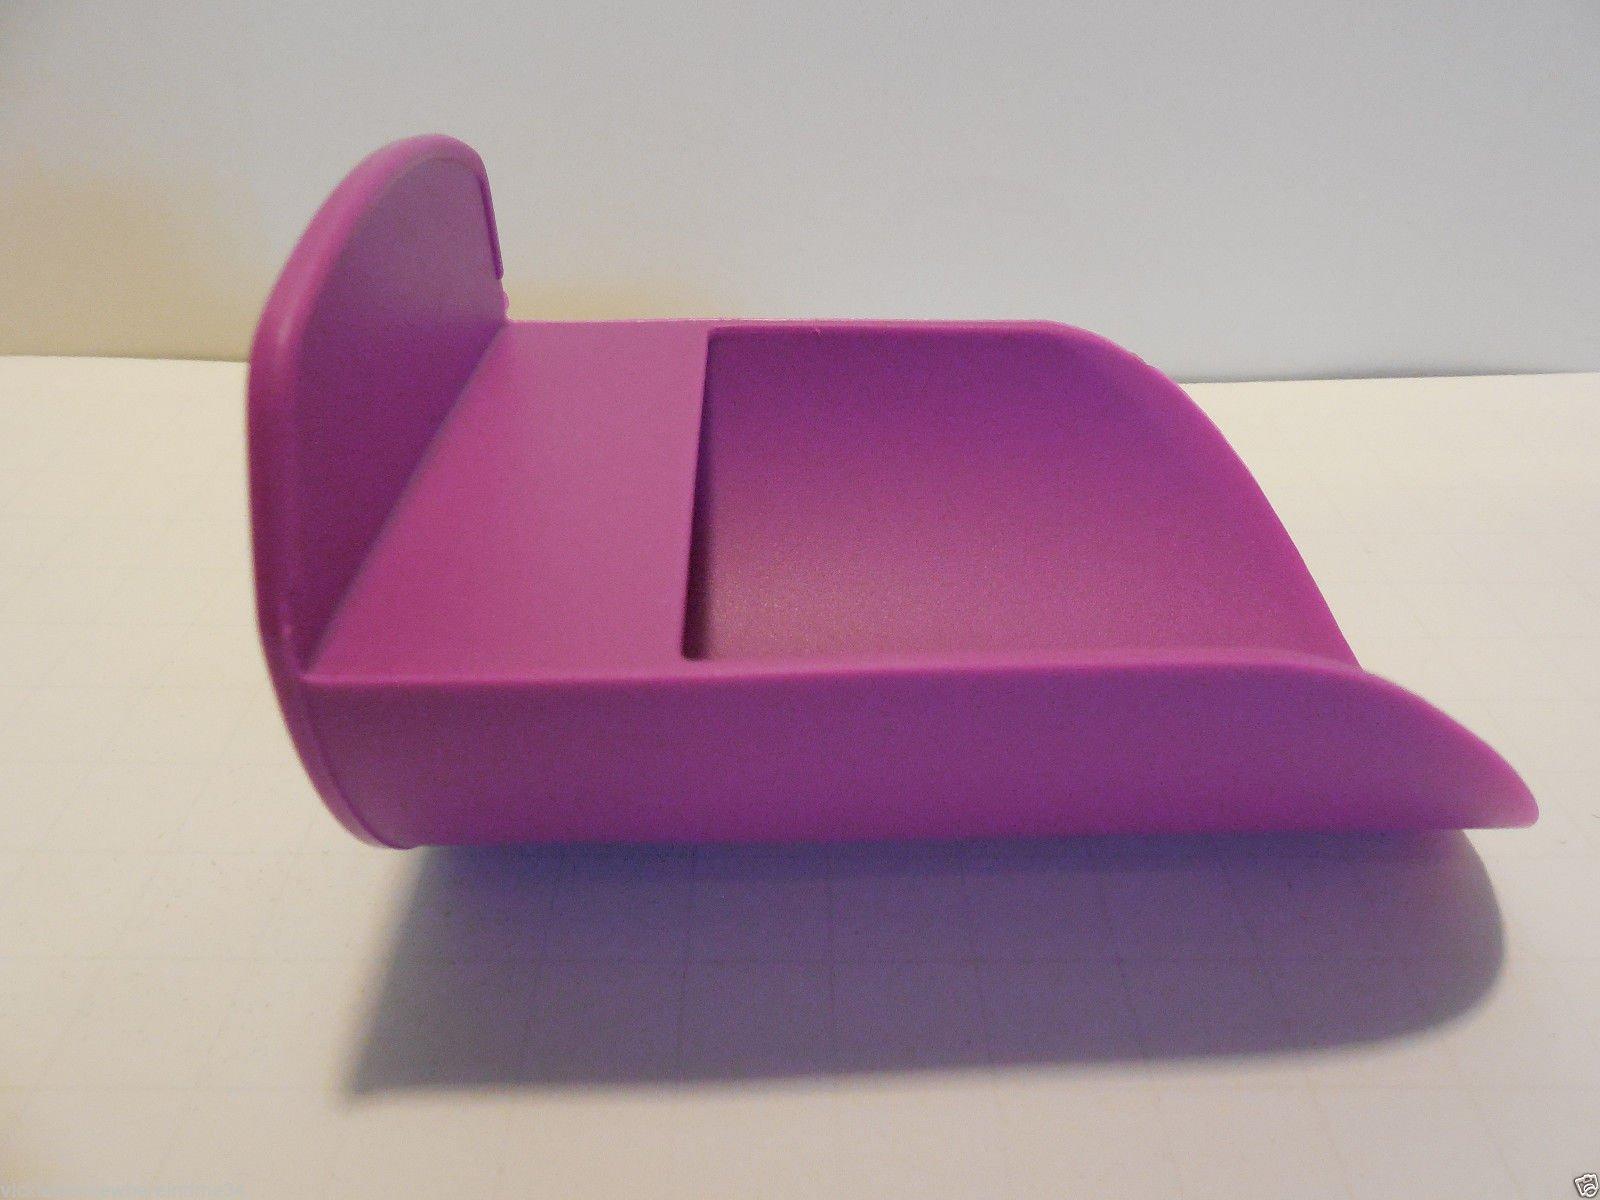 Tupperware Rocker Scoop, Canister Scoop, Purple, New